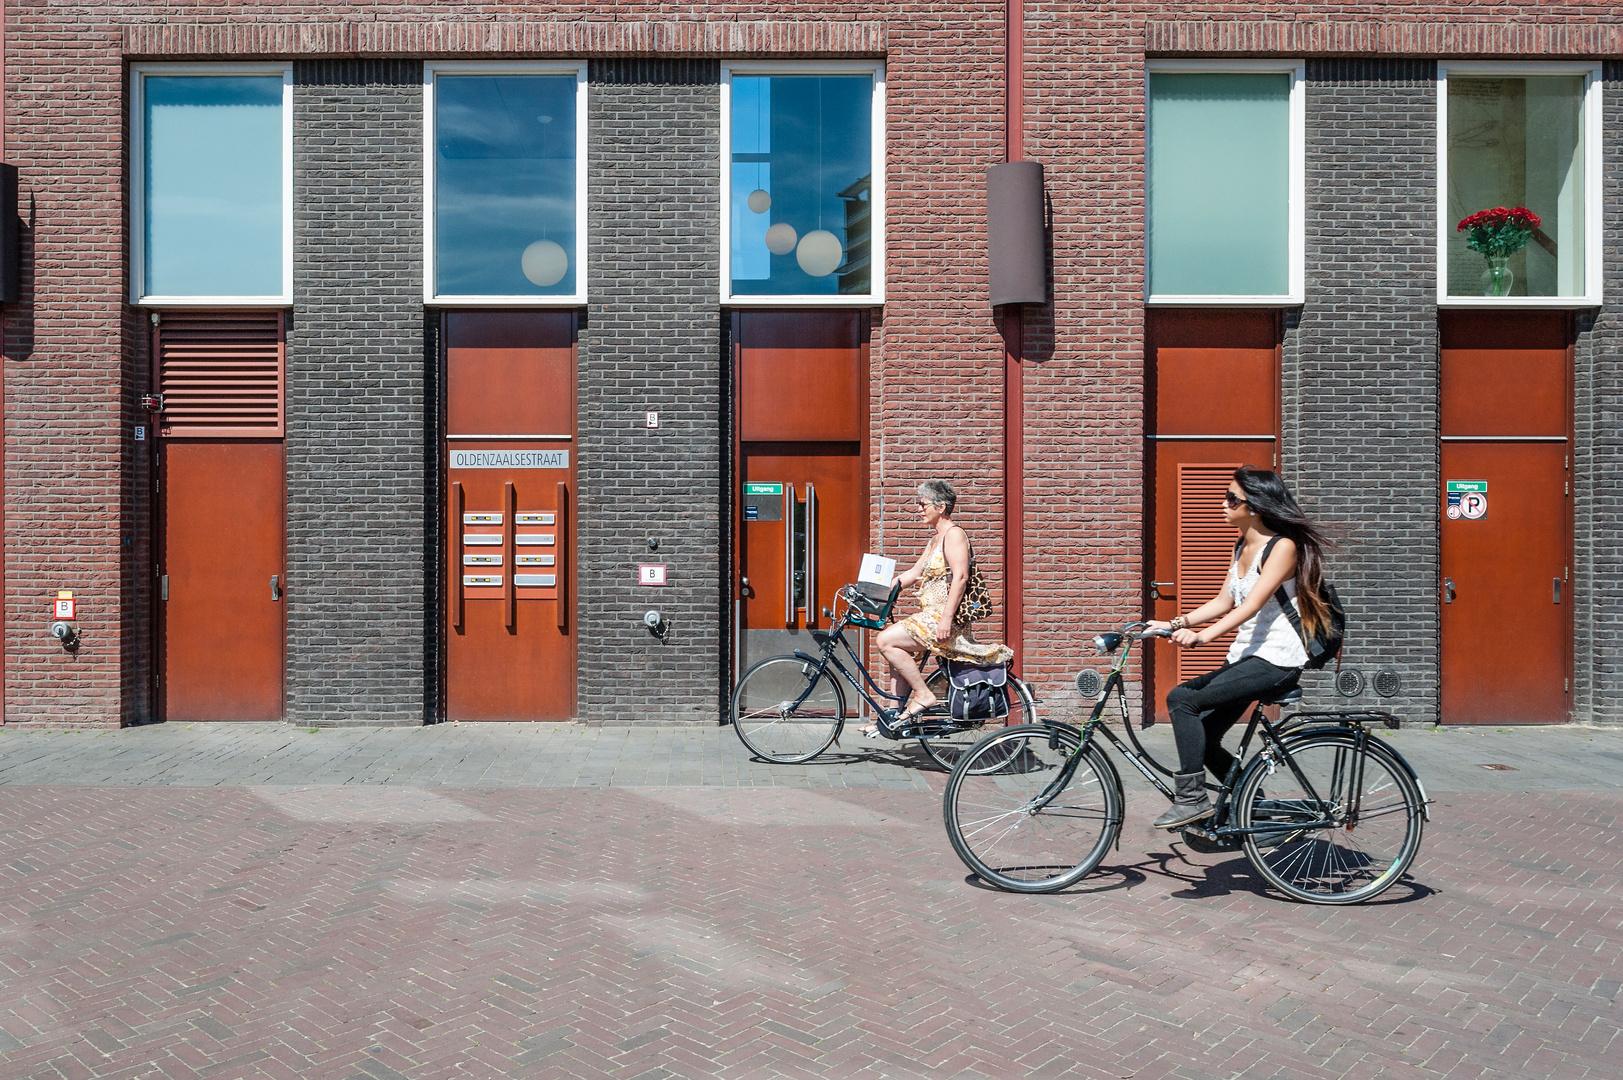 Enschede, Oldenzaalsestraat i.o.v. a.s.r. vastgoed vermogensbeheer